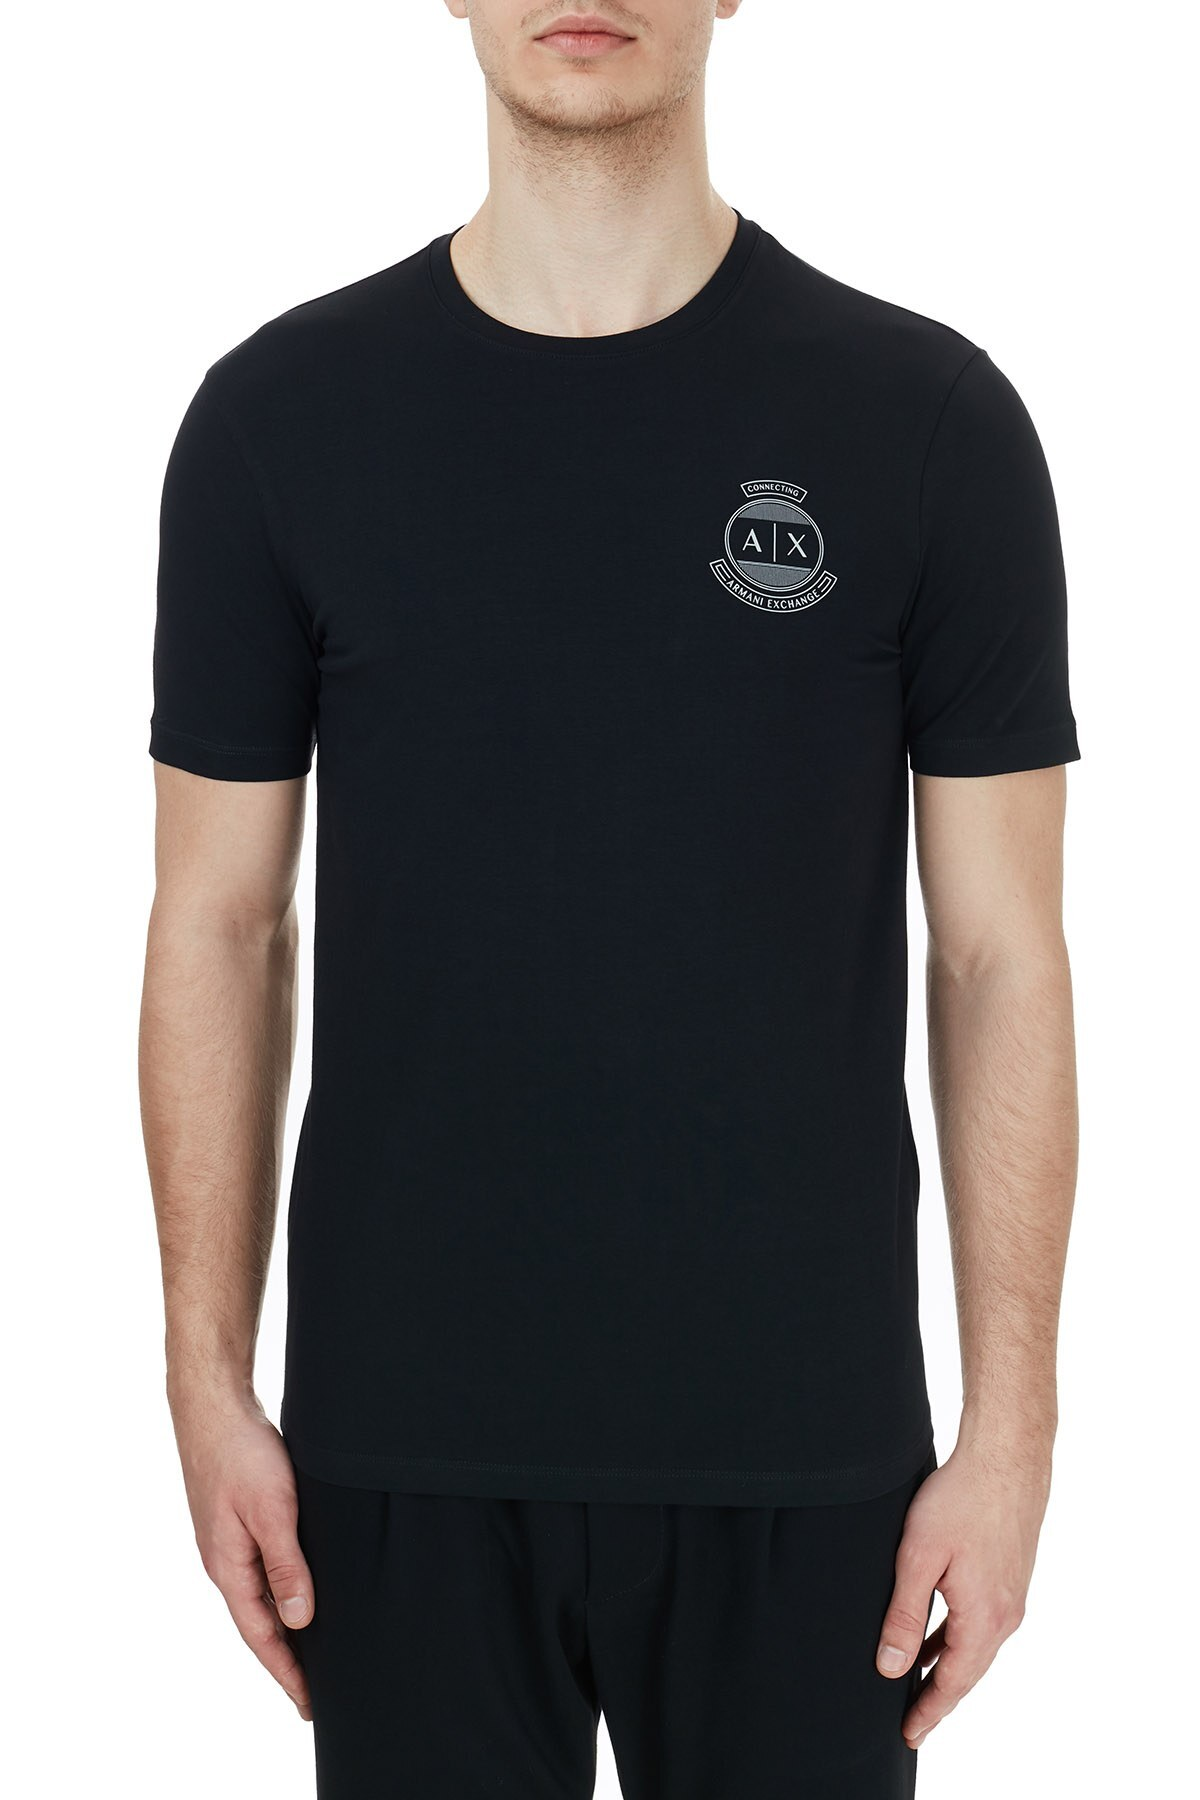 Armani Exchange Pamuklu Baskılı Bisiklet Yaka Erkek T Shirt 6HZTFL ZJE6Z 1200 SİYAH